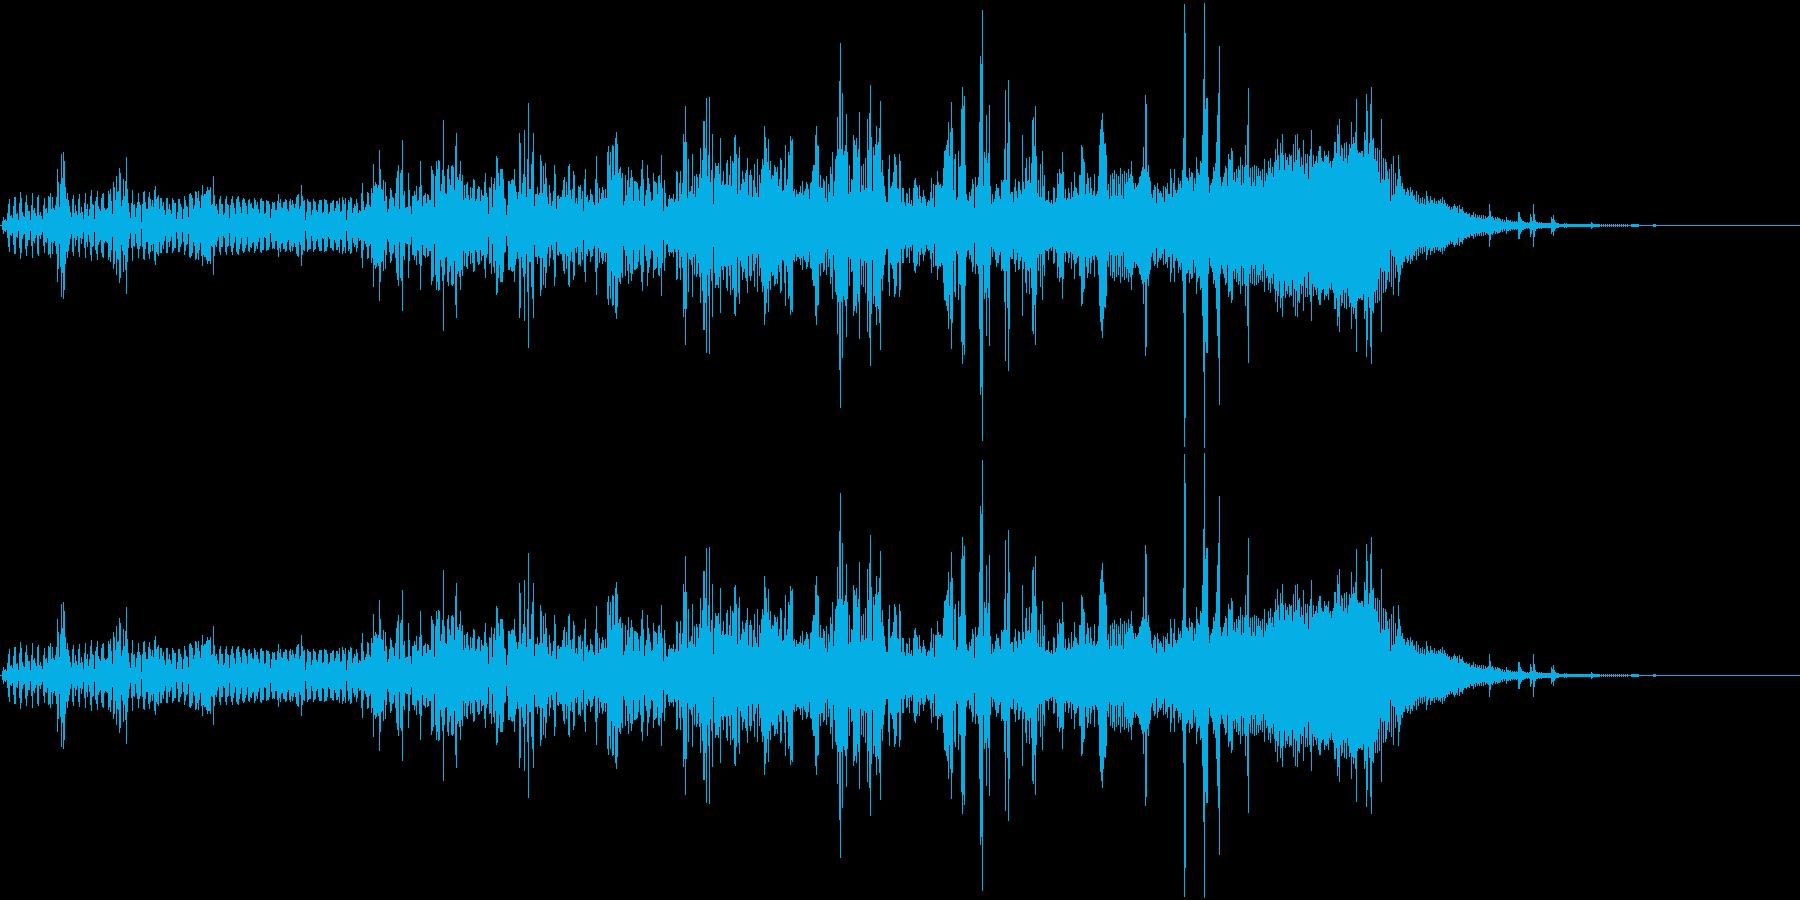 【SE 効果音】不気味な音2の再生済みの波形